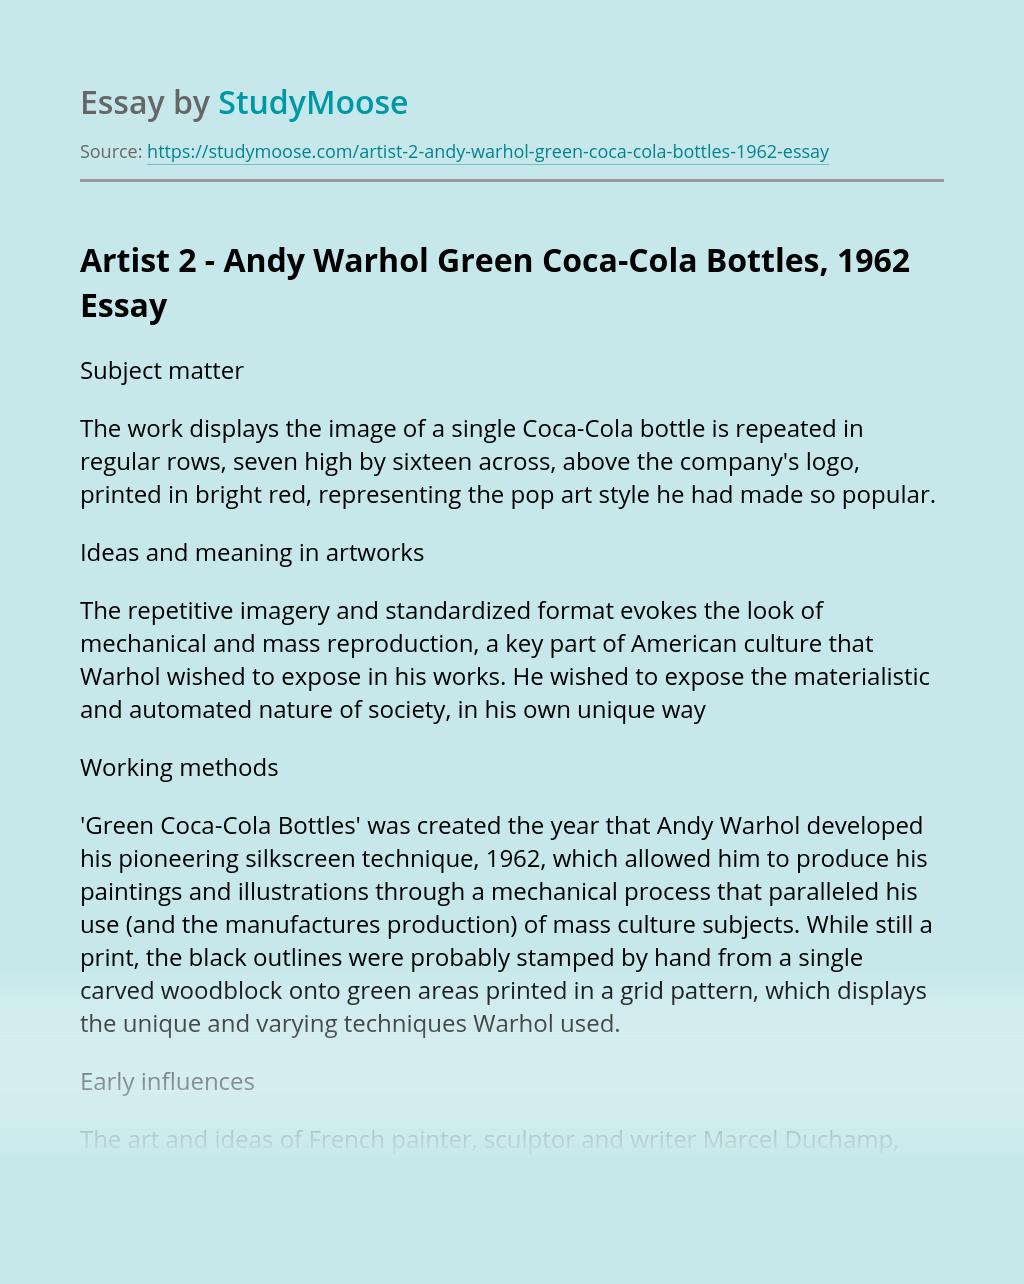 Artist 2 - Andy Warhol  Green Coca-Cola Bottles, 1962